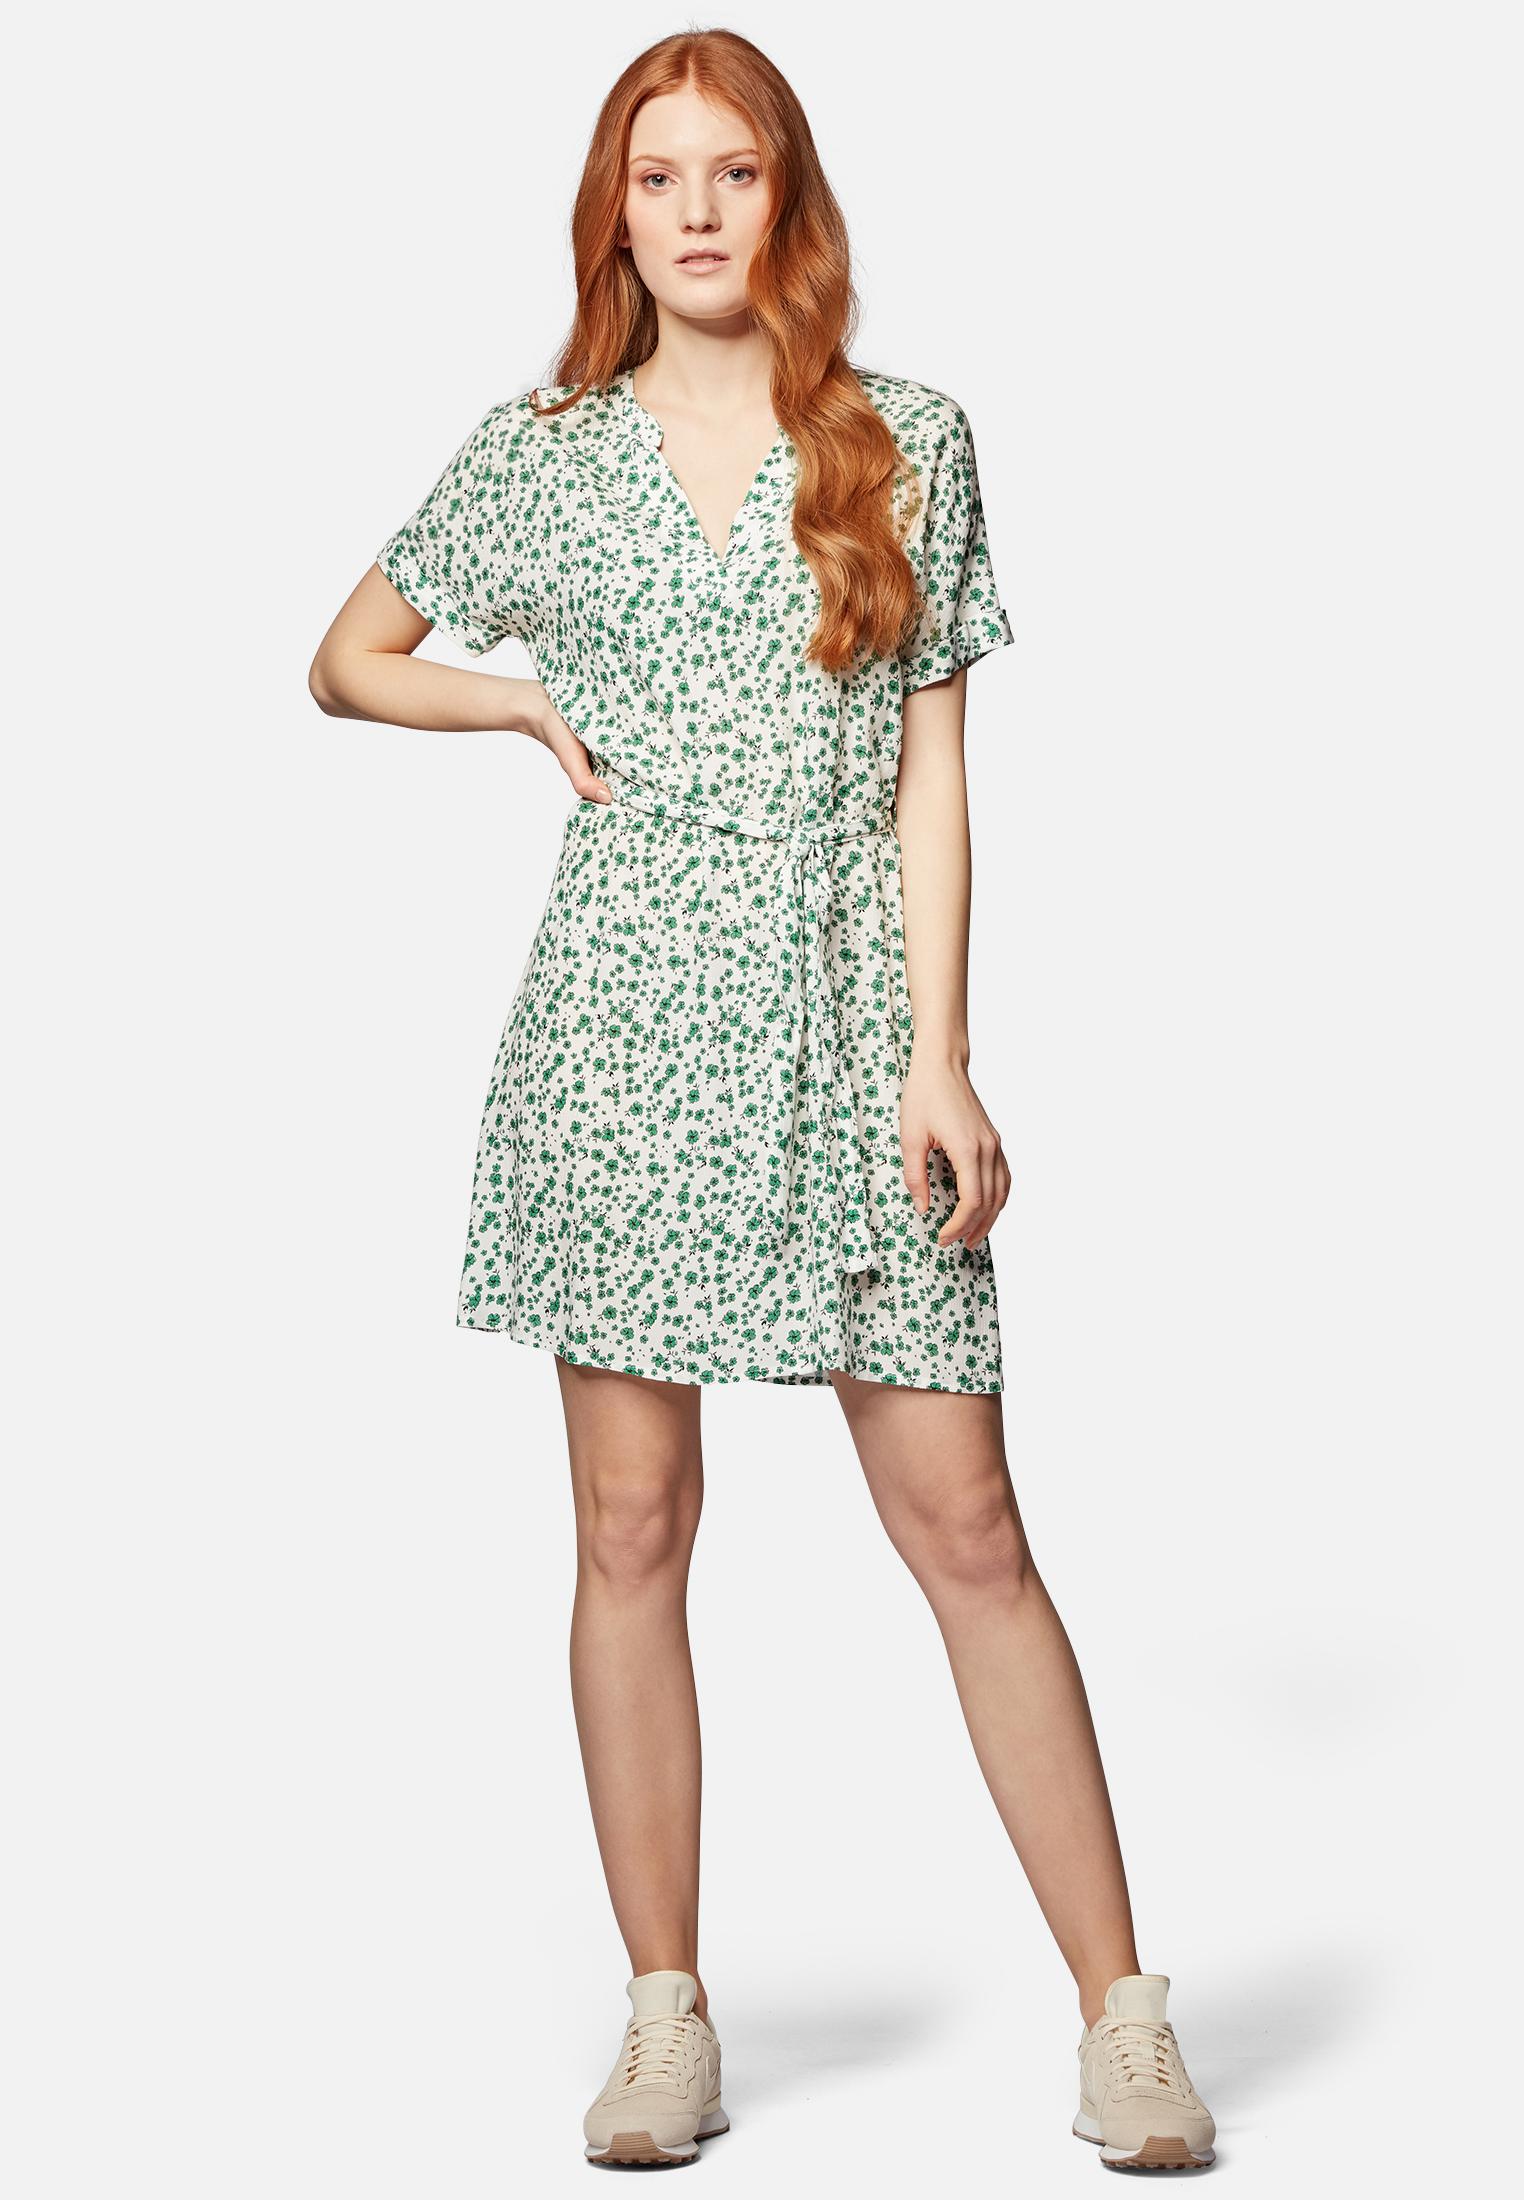 Mavi KLEID | Kurzes Kleid mit floralem Print in grün